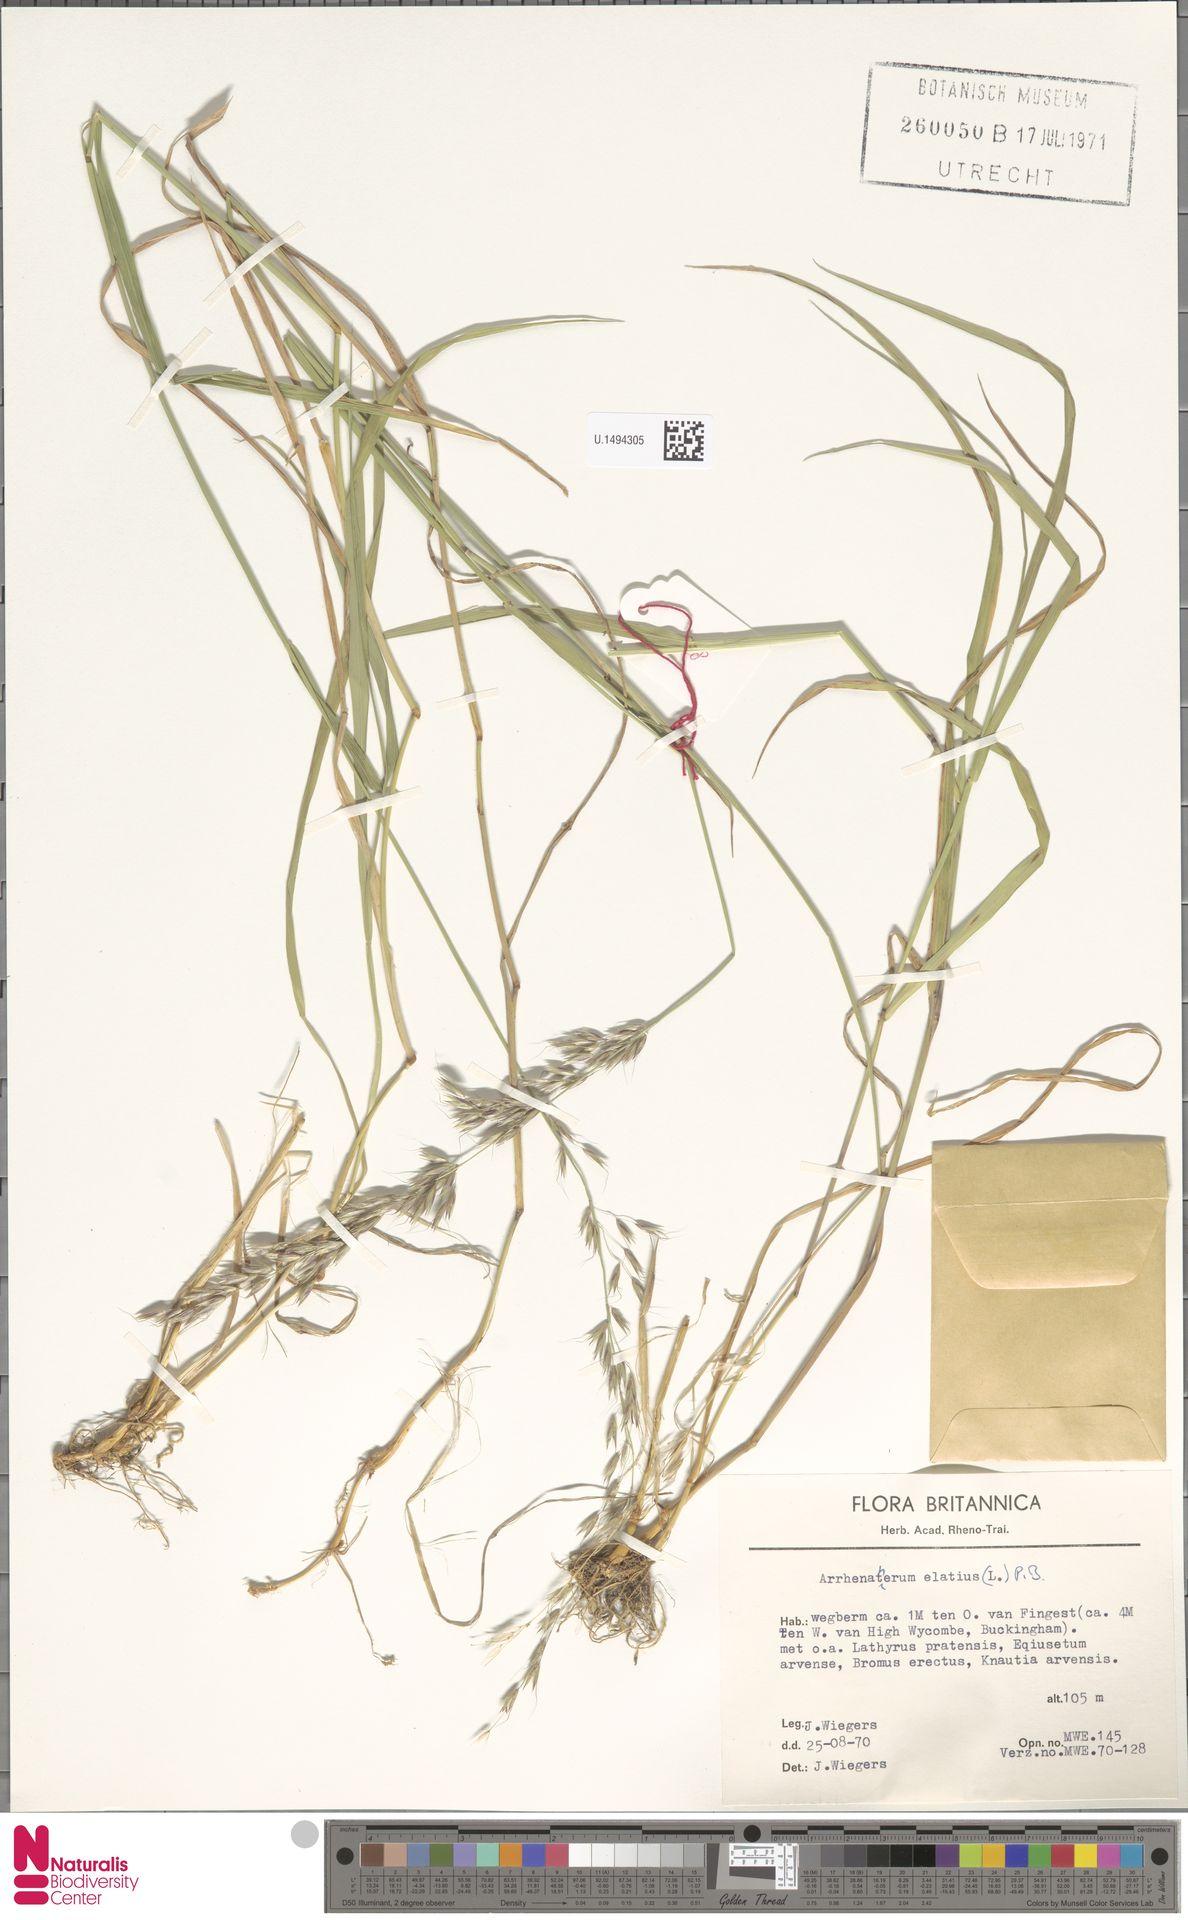 U.1494305   Arrhenatherum elatius (L.) P.Beauv. ex J.Presl & C.Presl